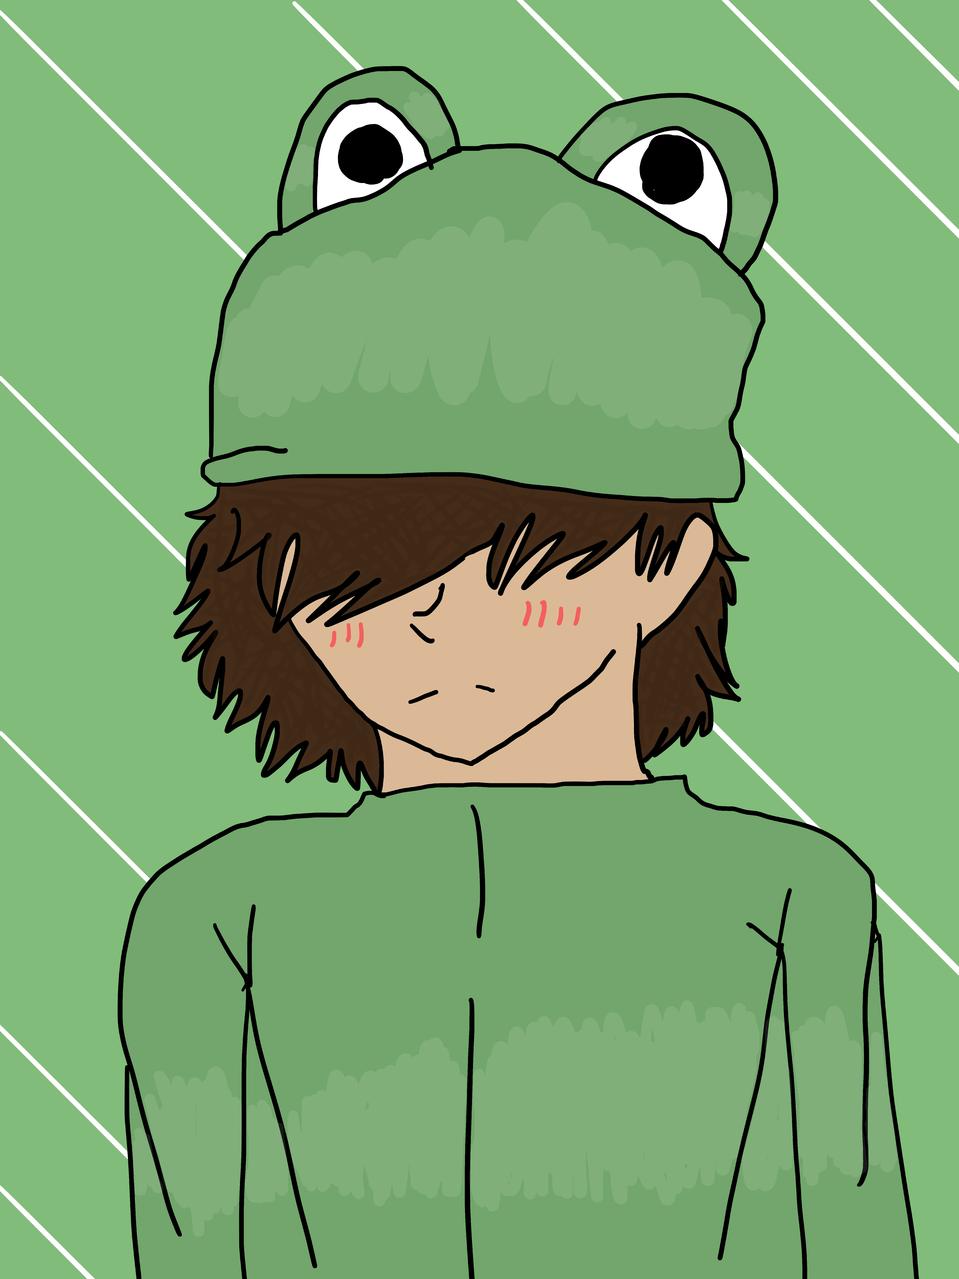 requests repost (READ DESC VERY IMPORTANT) Illust of Lil devil (Baku mode) oc Requests